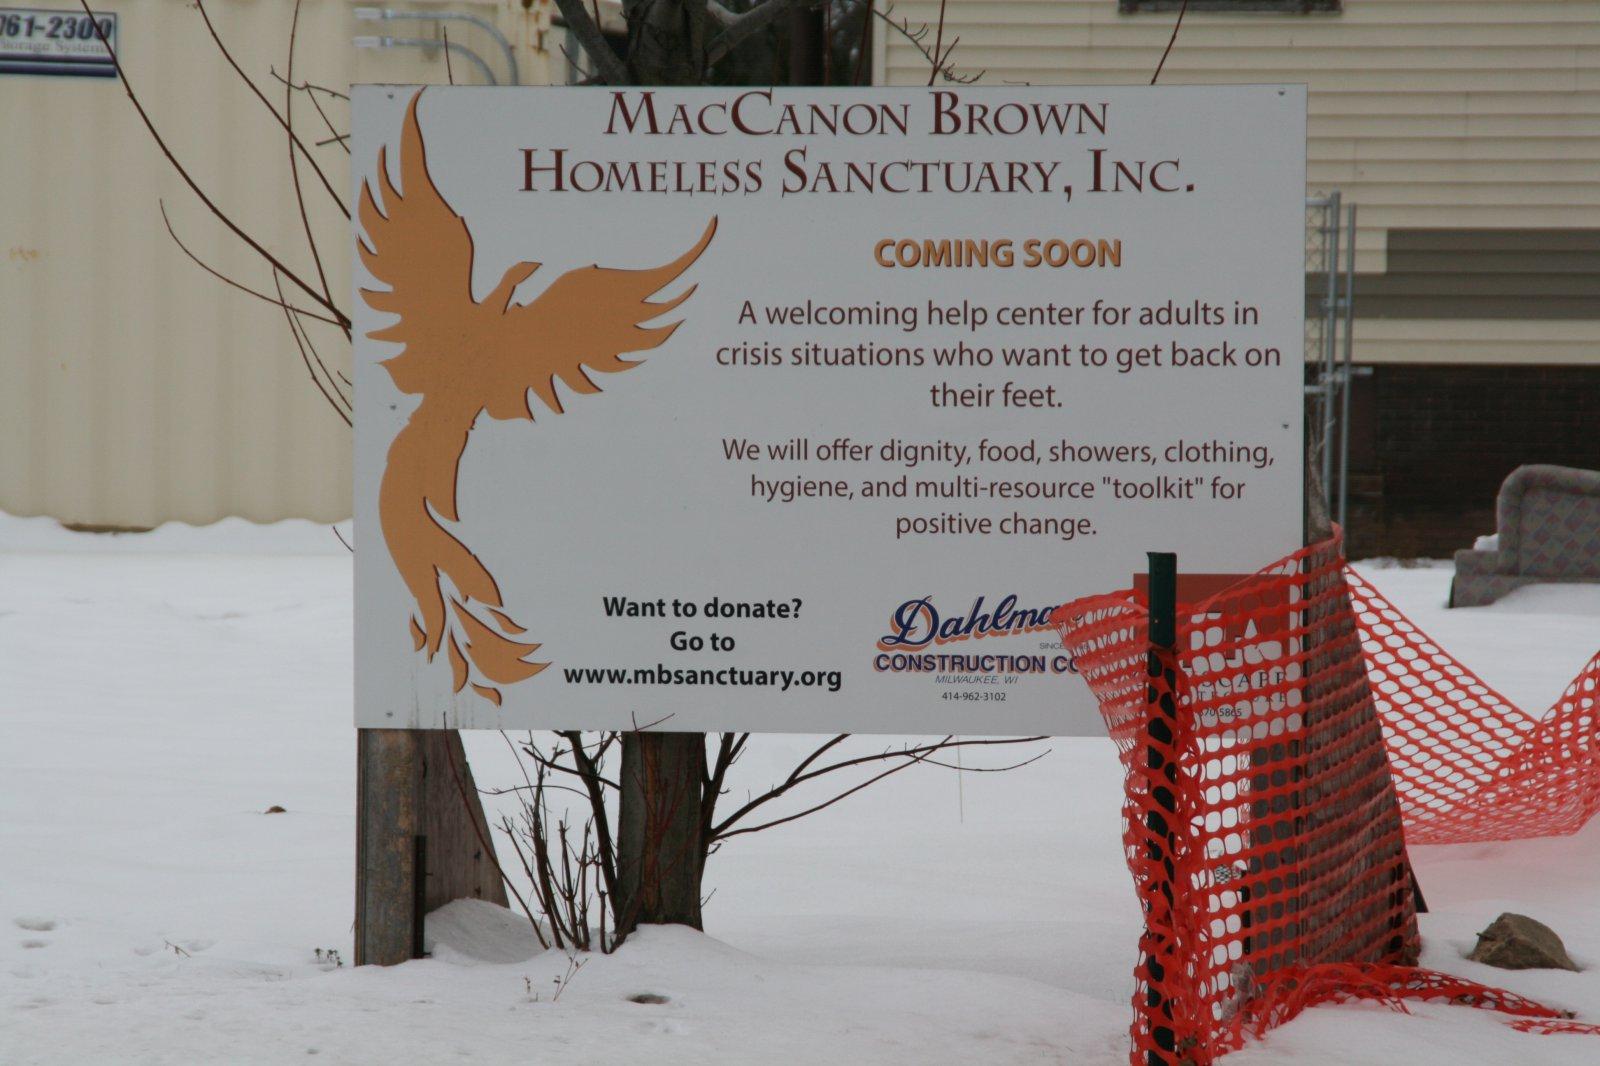 MacCanon Brown Homeless Sanctuary